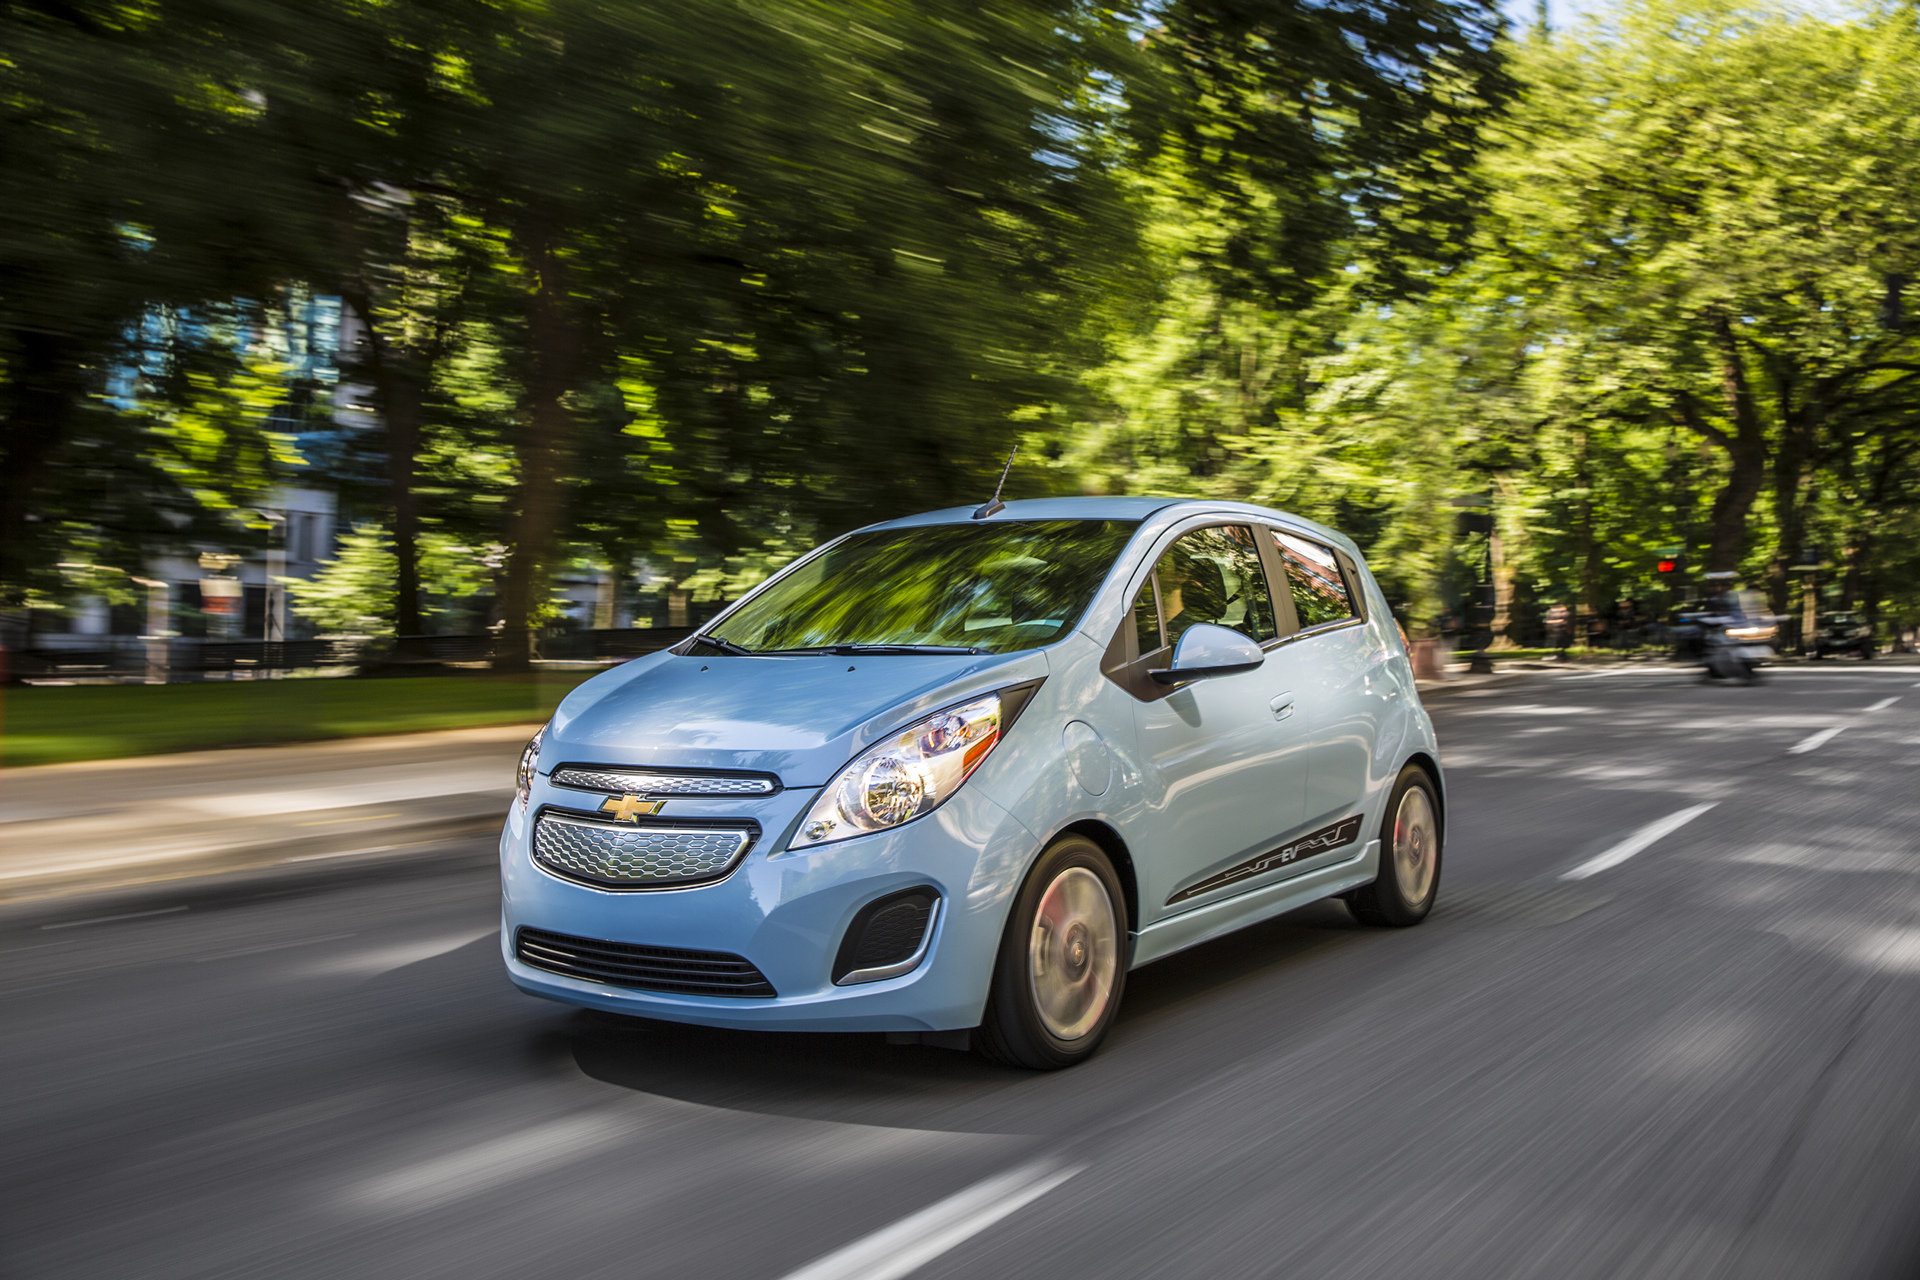 2016 Chevrolet Spark EV Review Carrrs Auto Portal